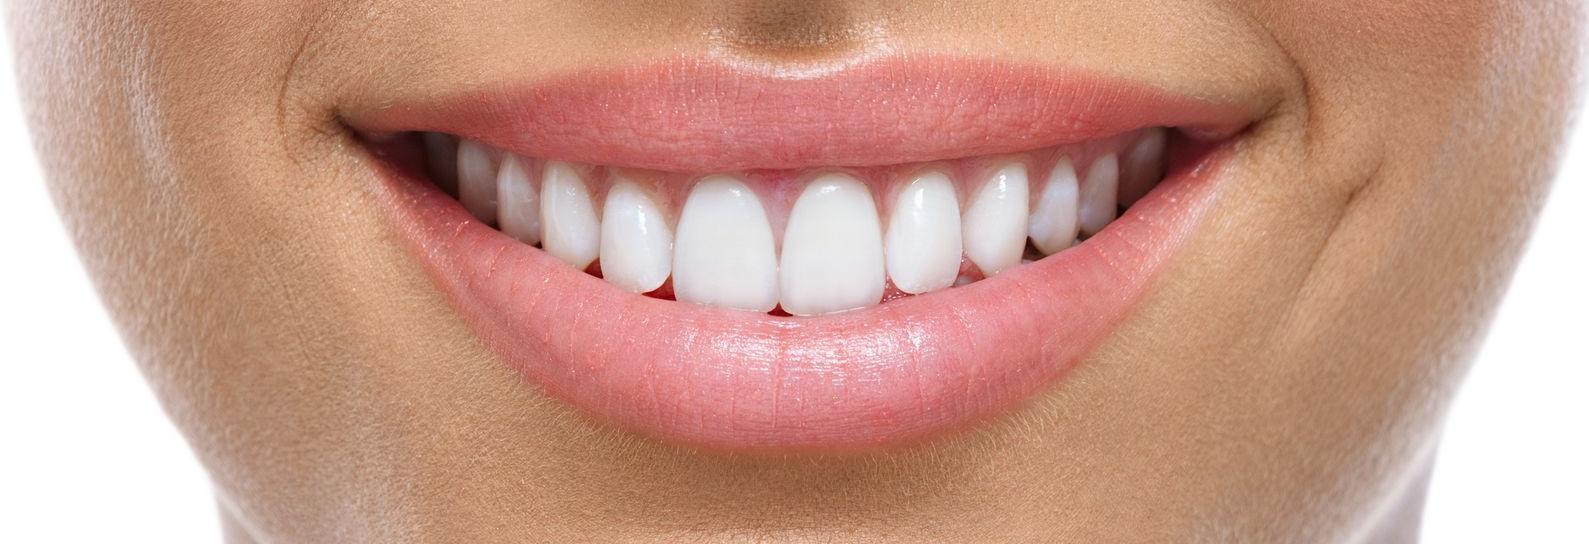 smile, dental, cleaning, crown